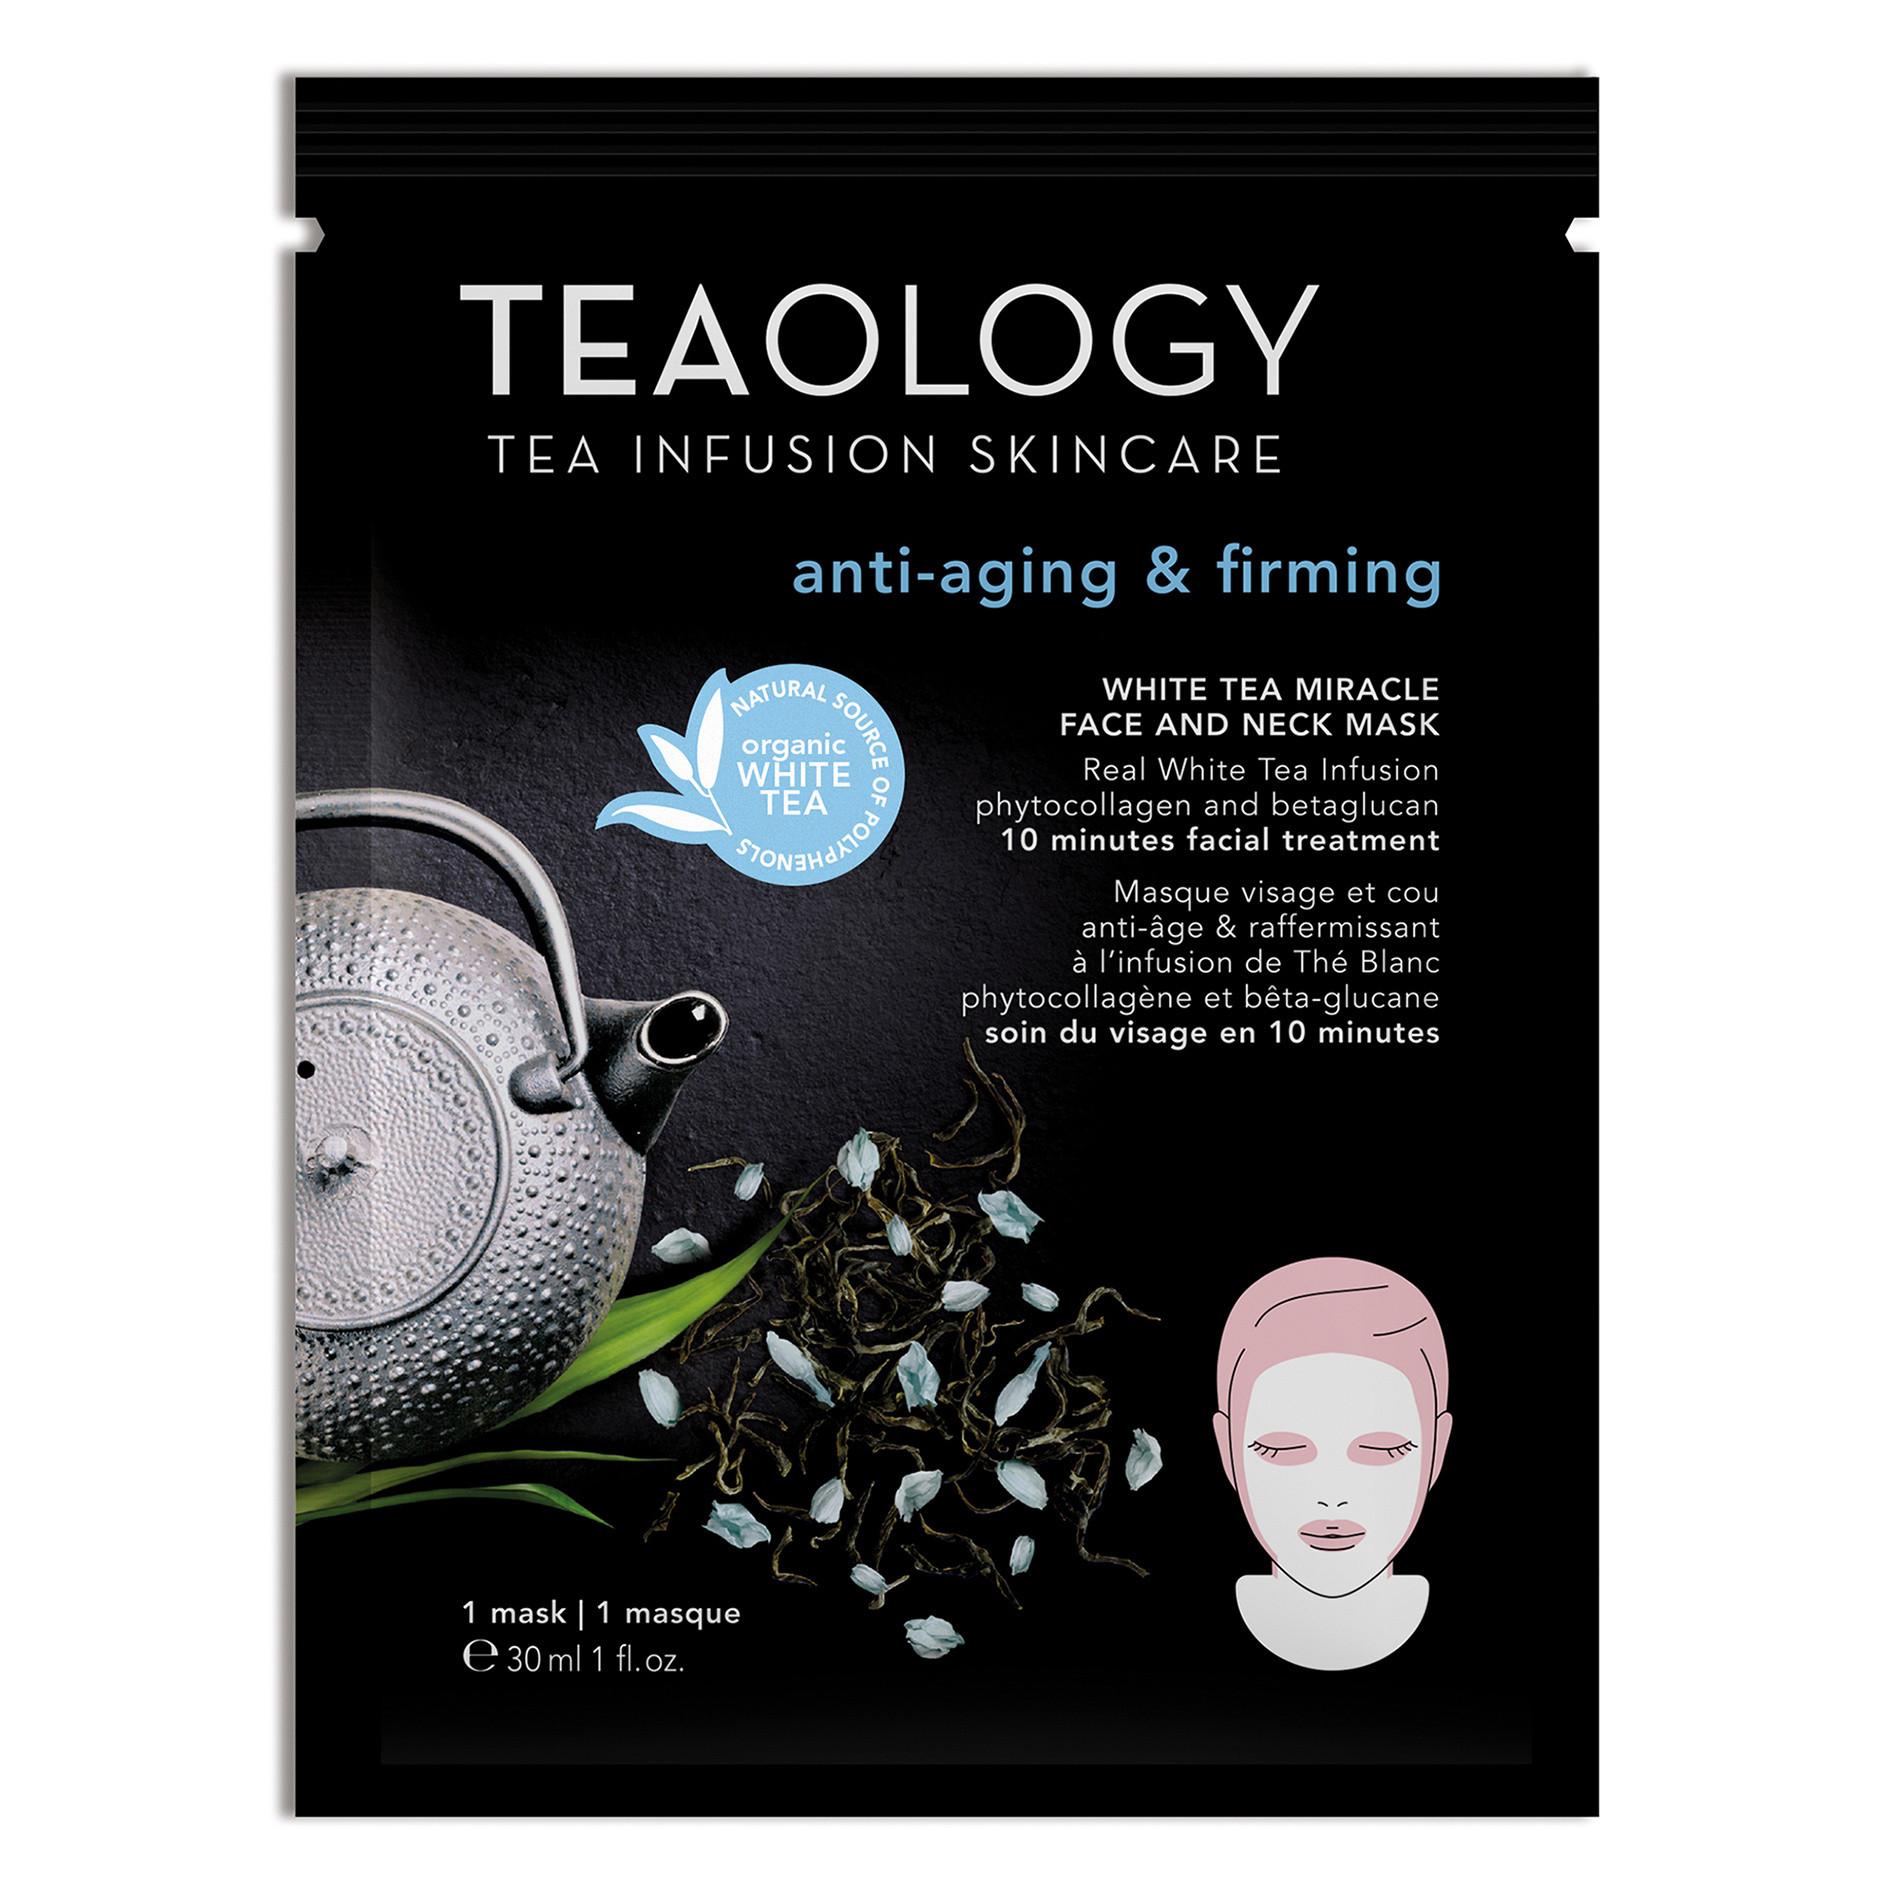 White Tea Miracle Maschera Viso e Collo Anti-aging  30 ml, Nero, large image number 0